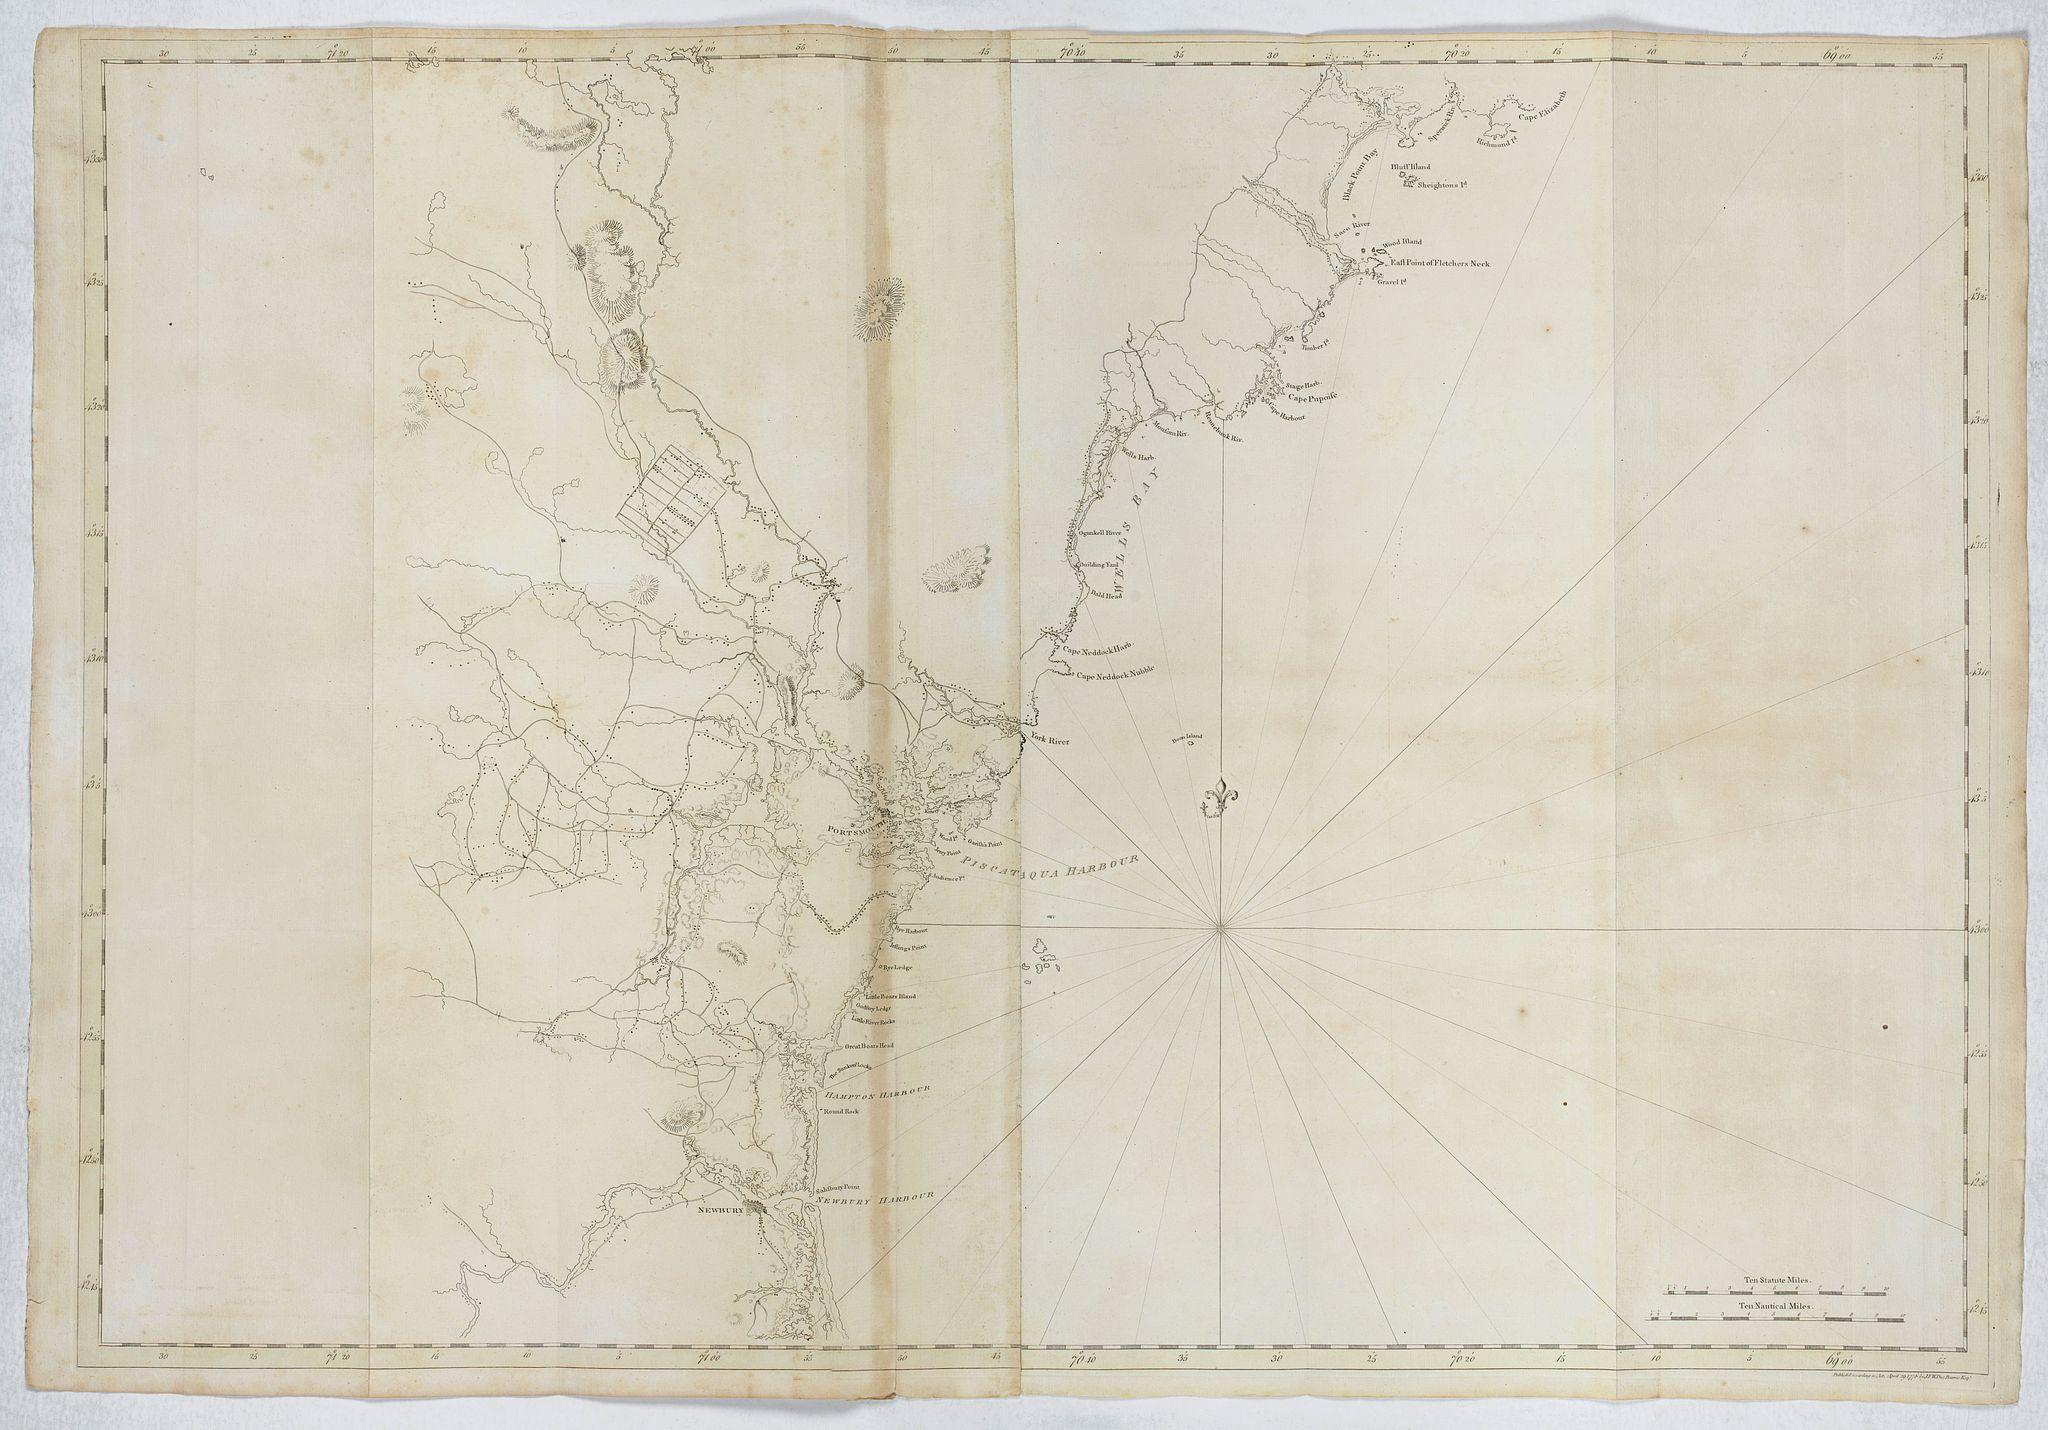 DES BARRES, J.F.W. -  [ Wells Bay, Piscataqua Harbour, Hampton Harbour, Newbury Harbour and  Portsmouth (New Hampshire) ]